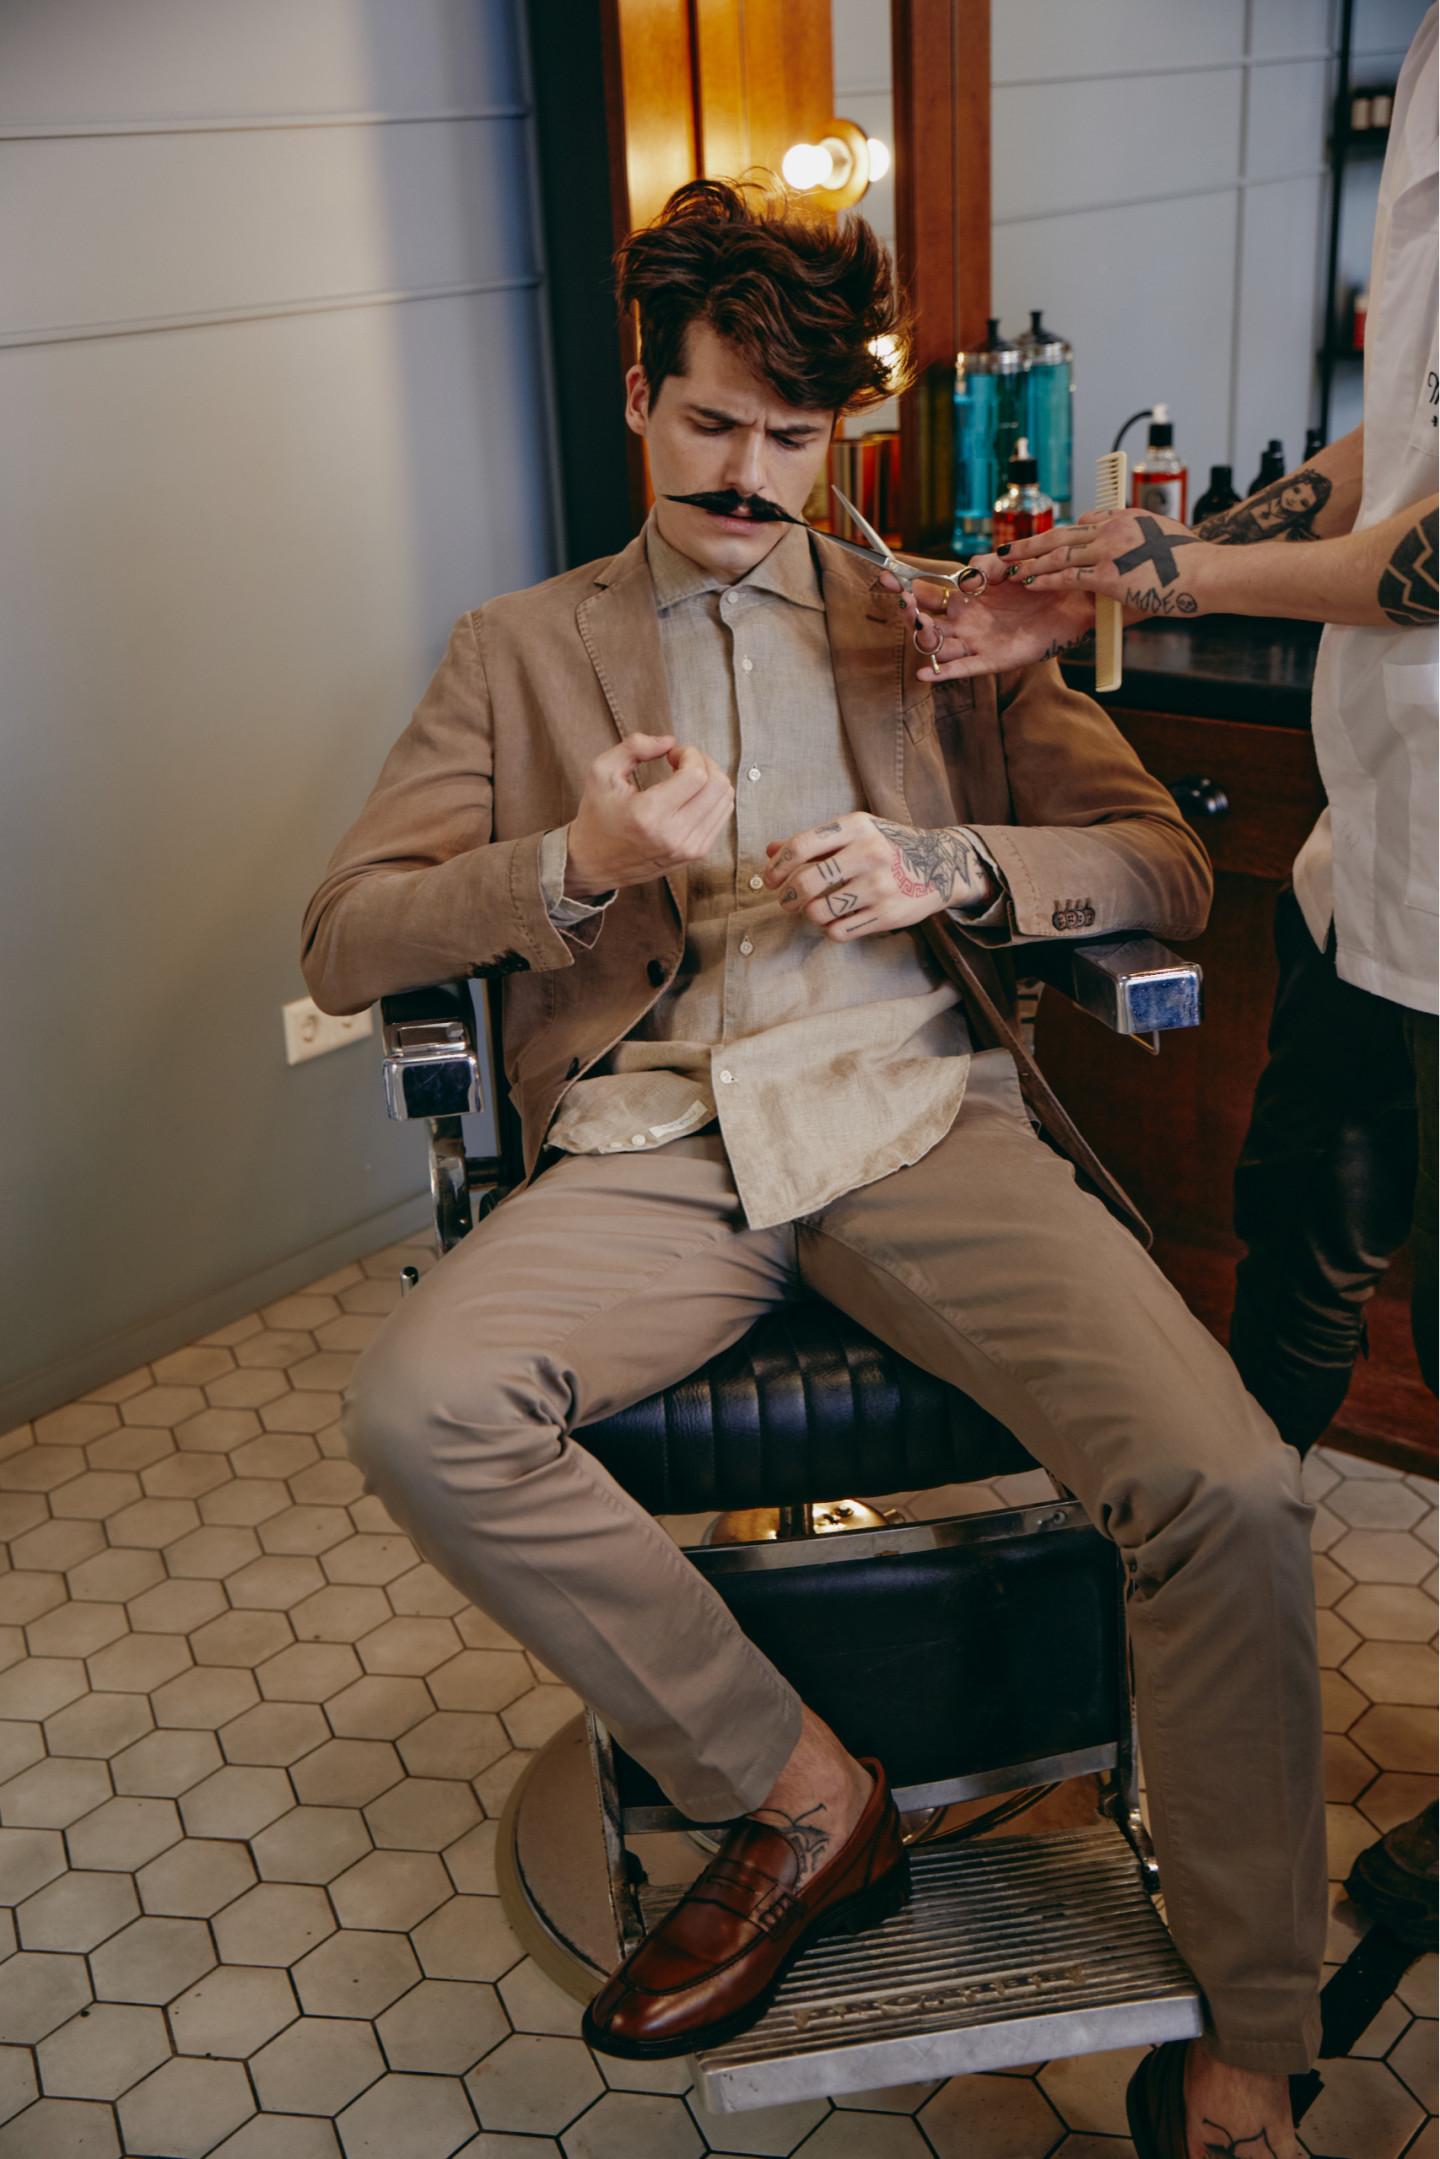 На Артуре: пиджак, сорочка, брюки — все Boggi Milano (ТРЦ «Афимолл Сити»); ботинки Geox (ТРЦ «Европейский»)